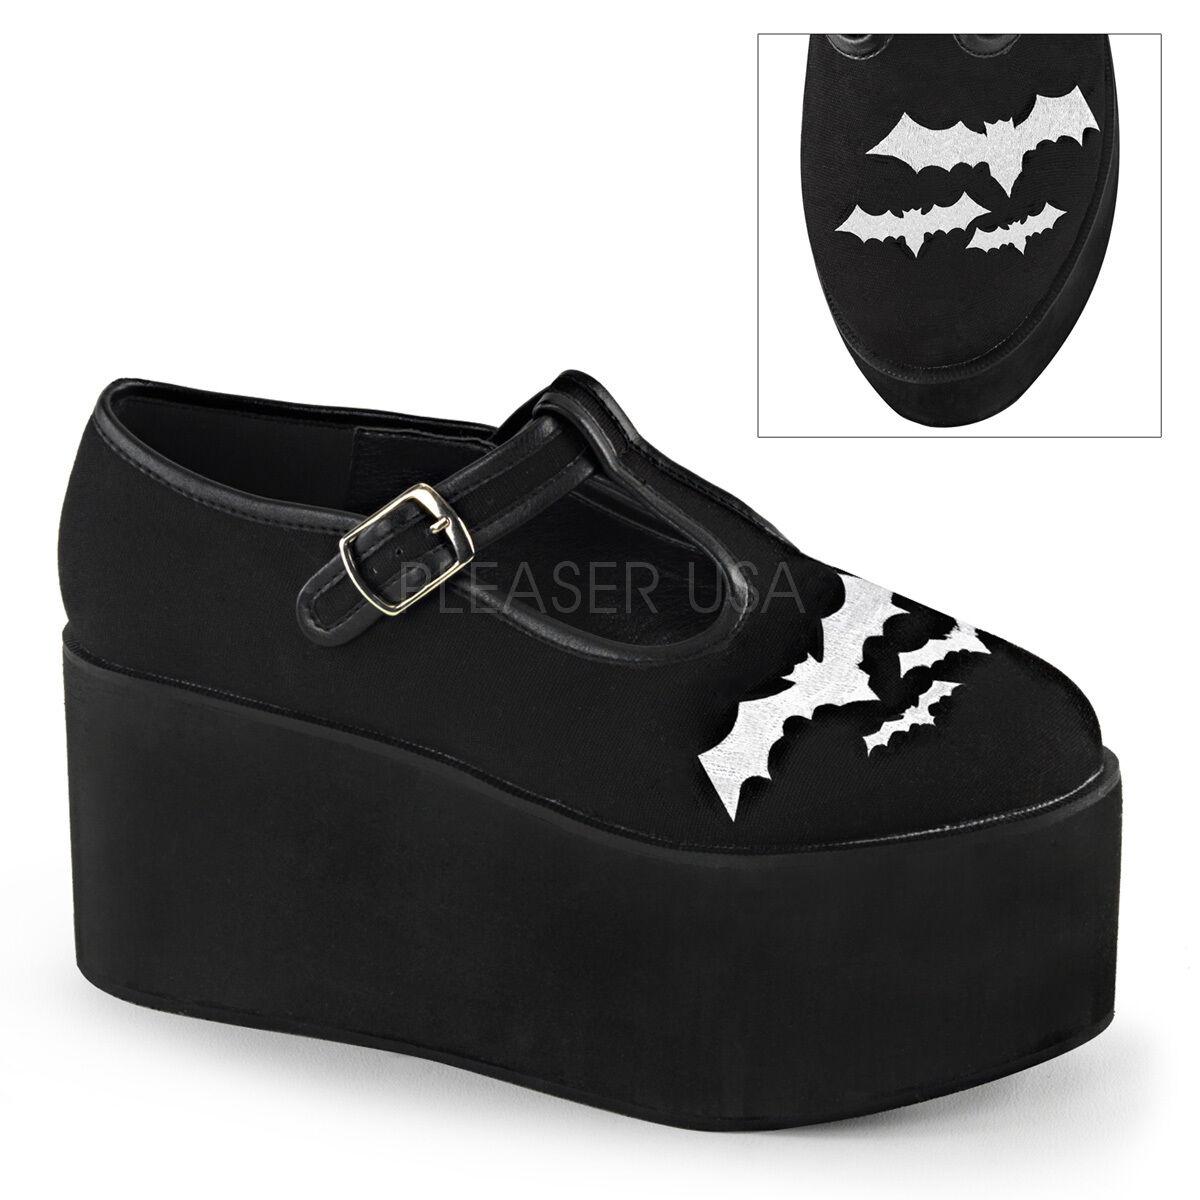 Huge Demonia Demonia Demonia 3.25  Monster Platform Black Canvas Embroidered Bat shoes Goth 6-11 93d50d